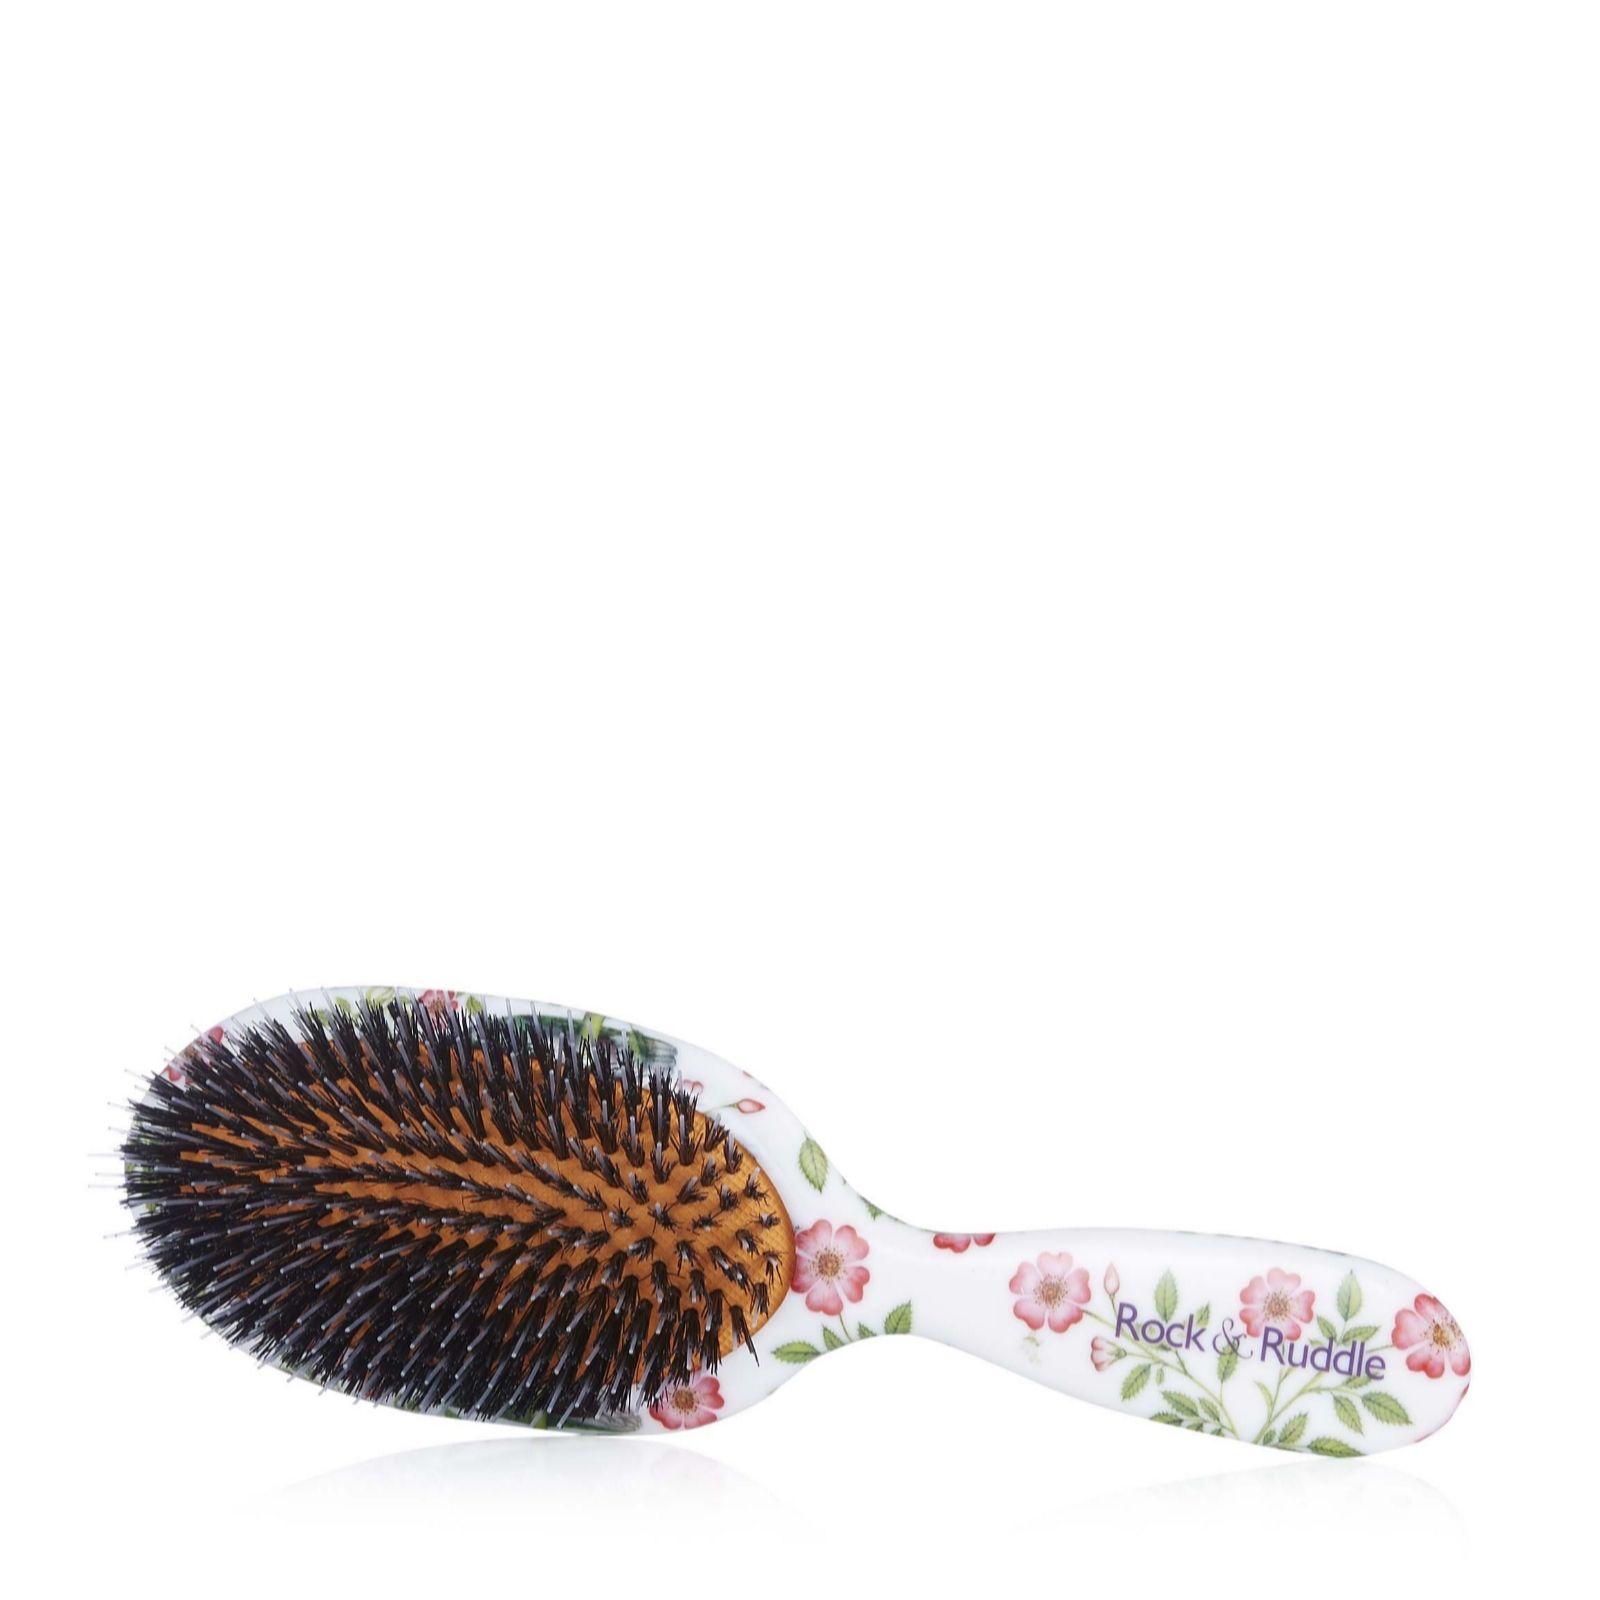 Rock & Ruddle Feather Friends Mixed Bristle Hairbrush - QVC UK